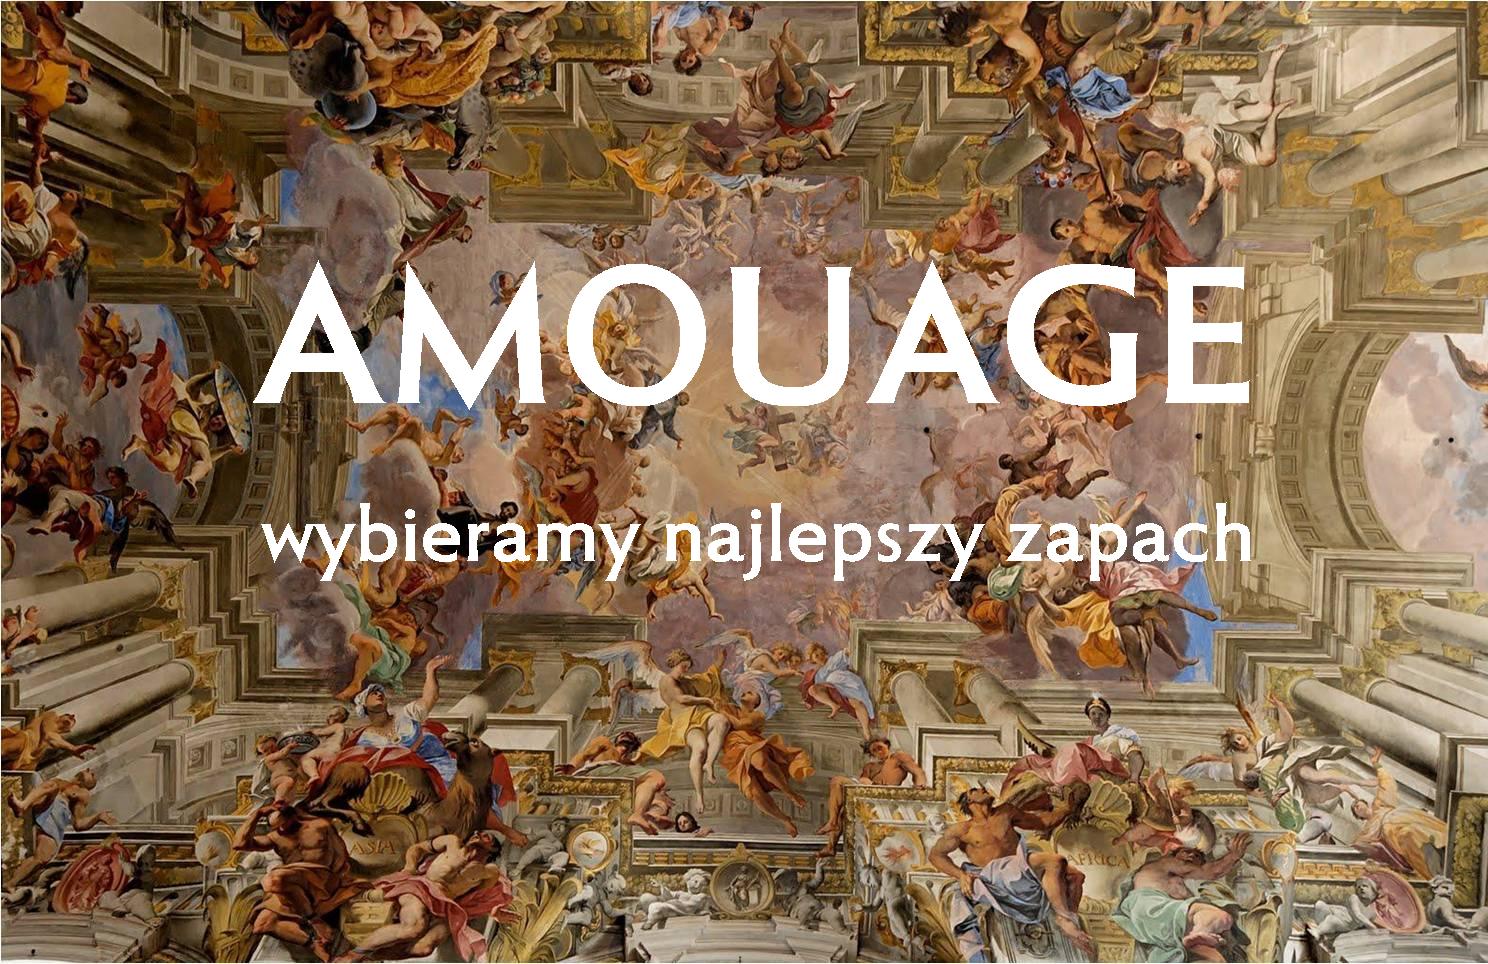 Amouage - najlepsze perfumy Amouage - opinie o Amouage